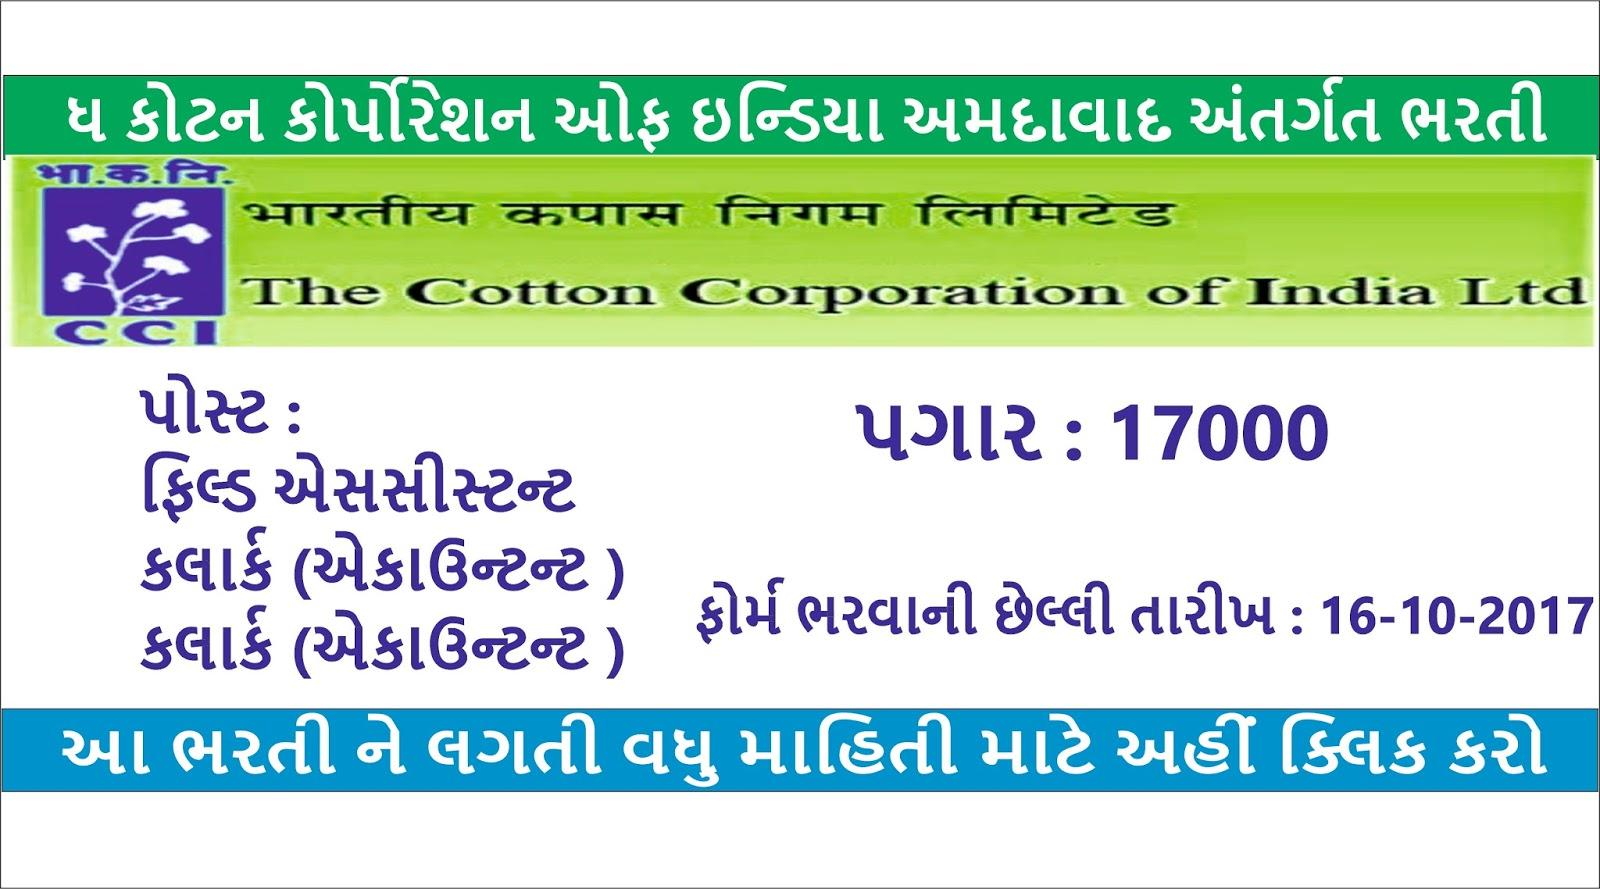 The Cotton Corporation of India Ltd (Ahmedabad) has